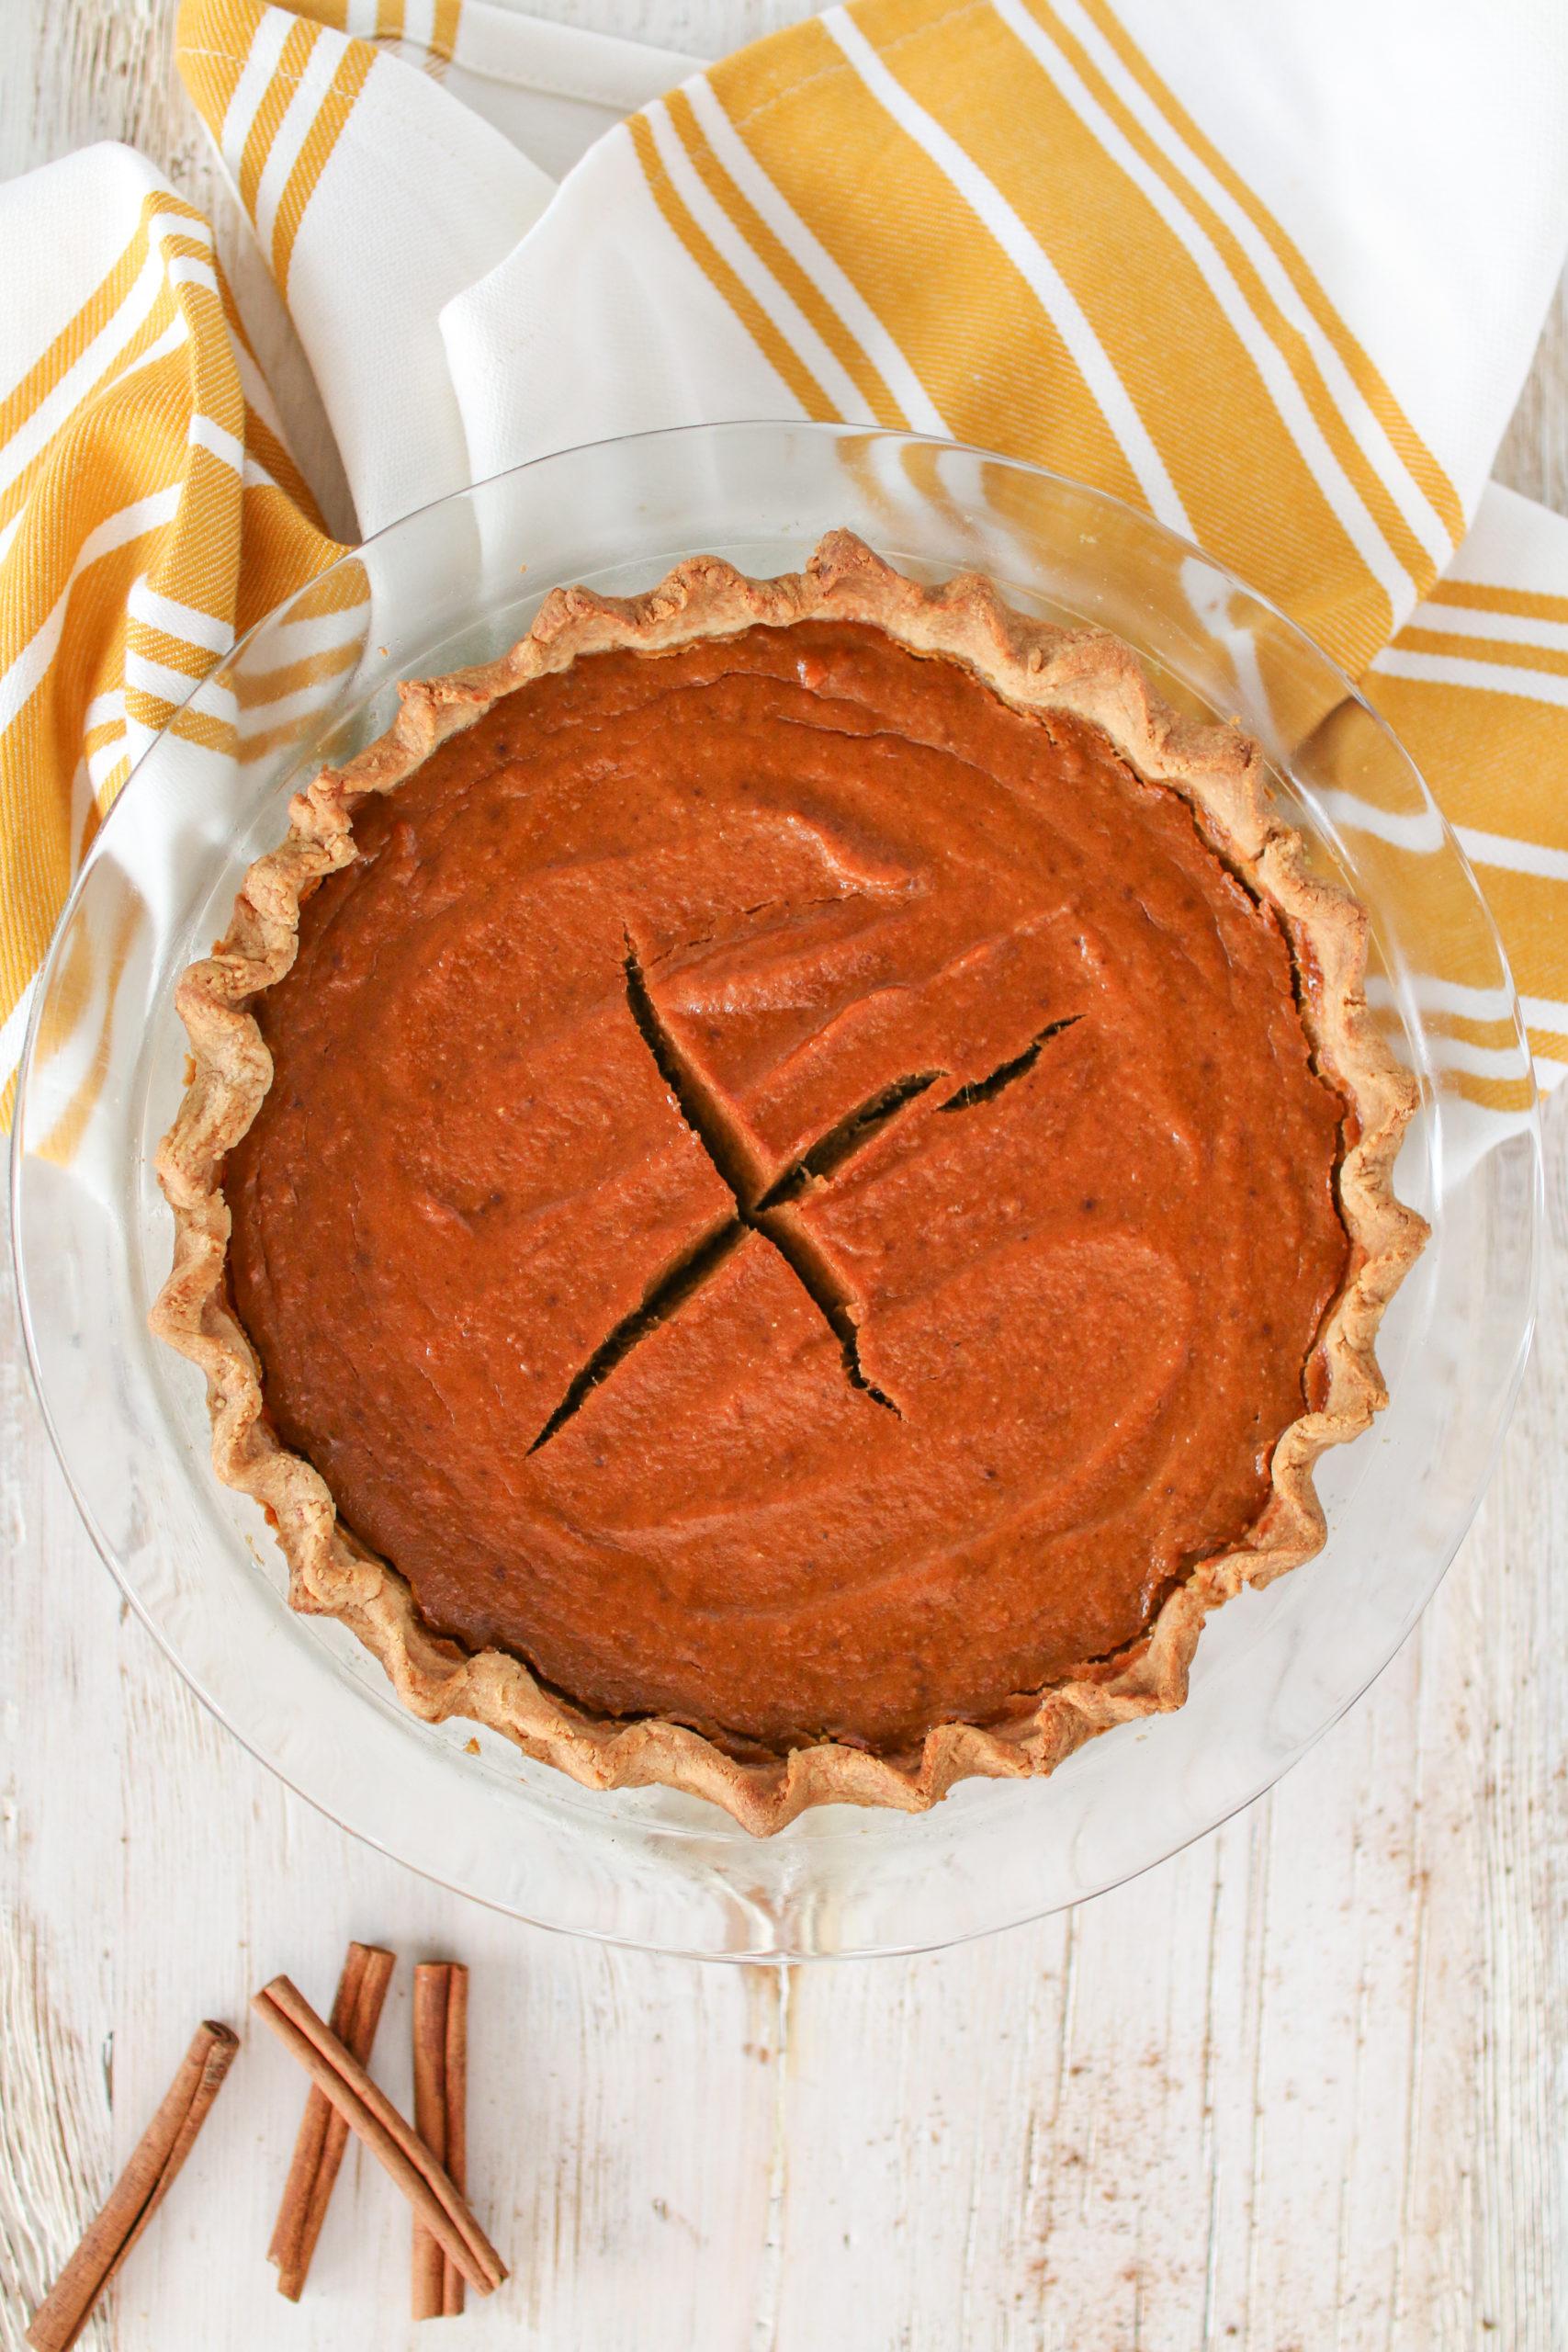 Bored of Pumpkin Pie Try This Tasty Alternative for ThanksgivingDinner